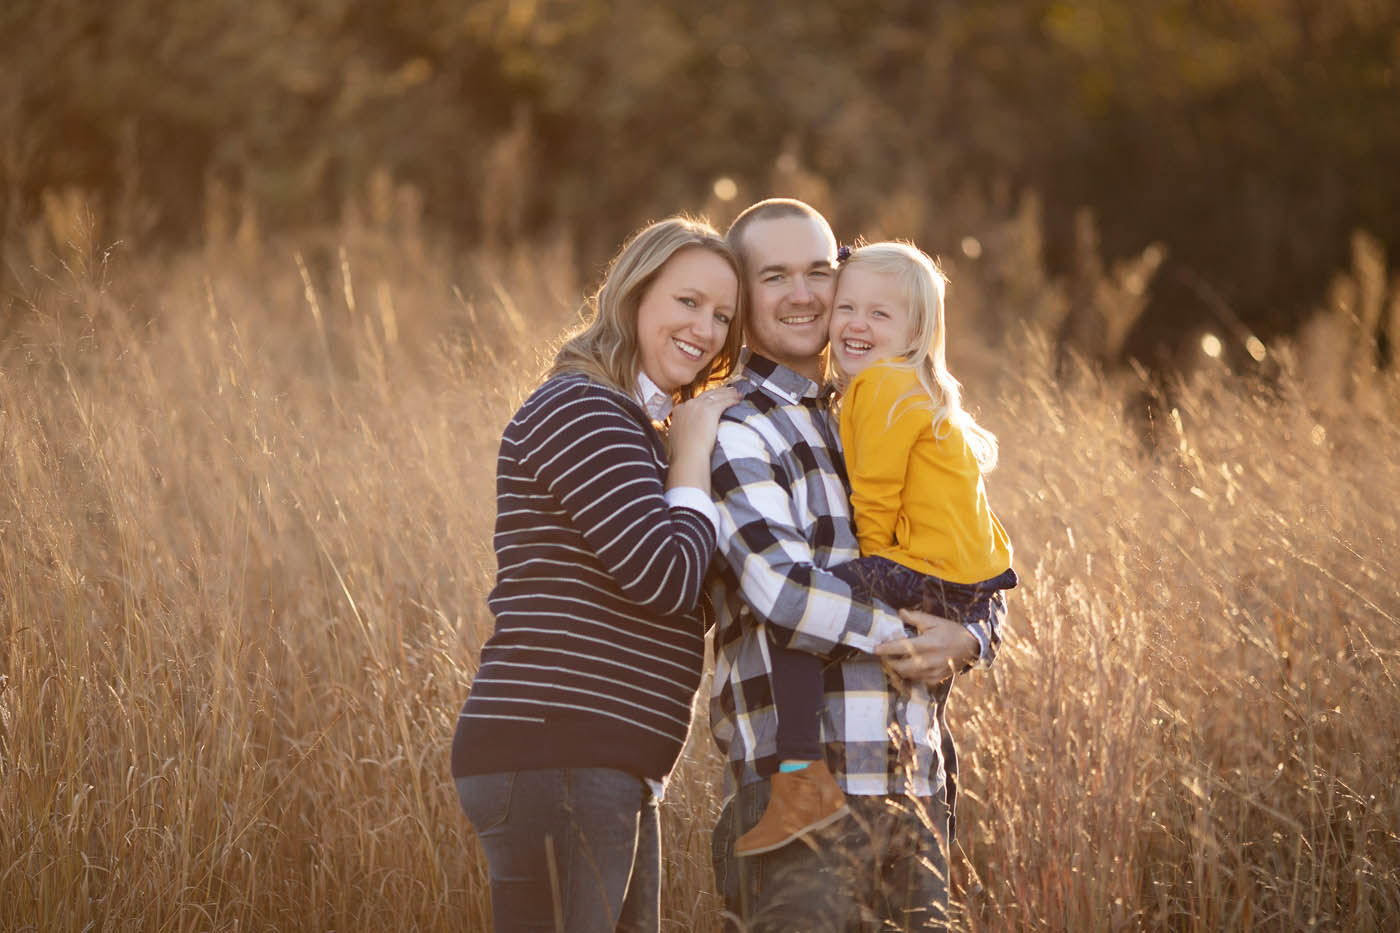 shalista_family_portraits003.jpg